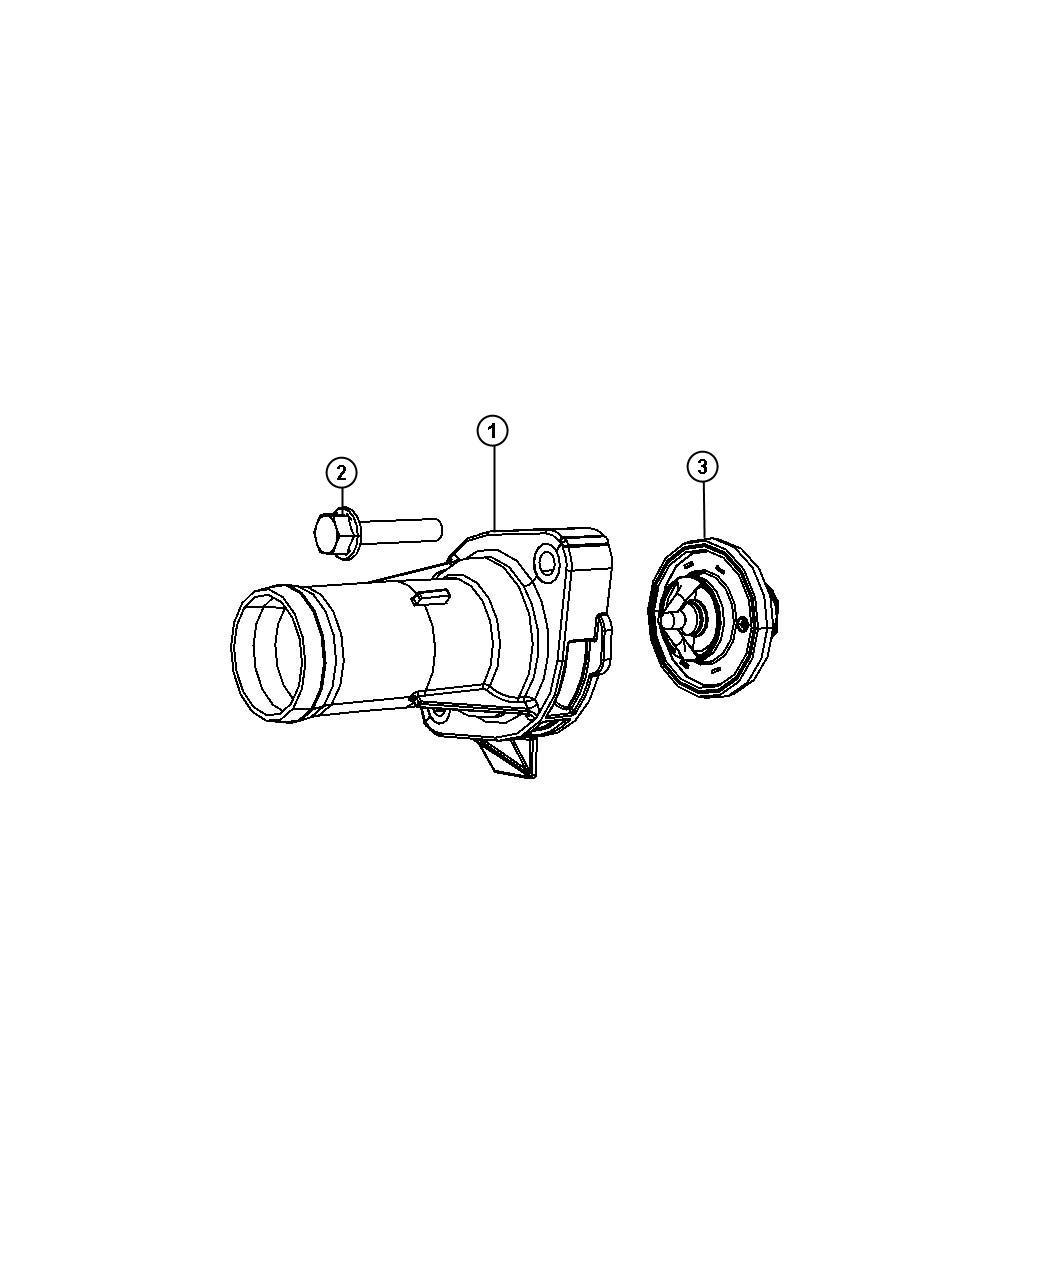 Chrysler Pacifica Parts Manual : Free Programs, Utilities